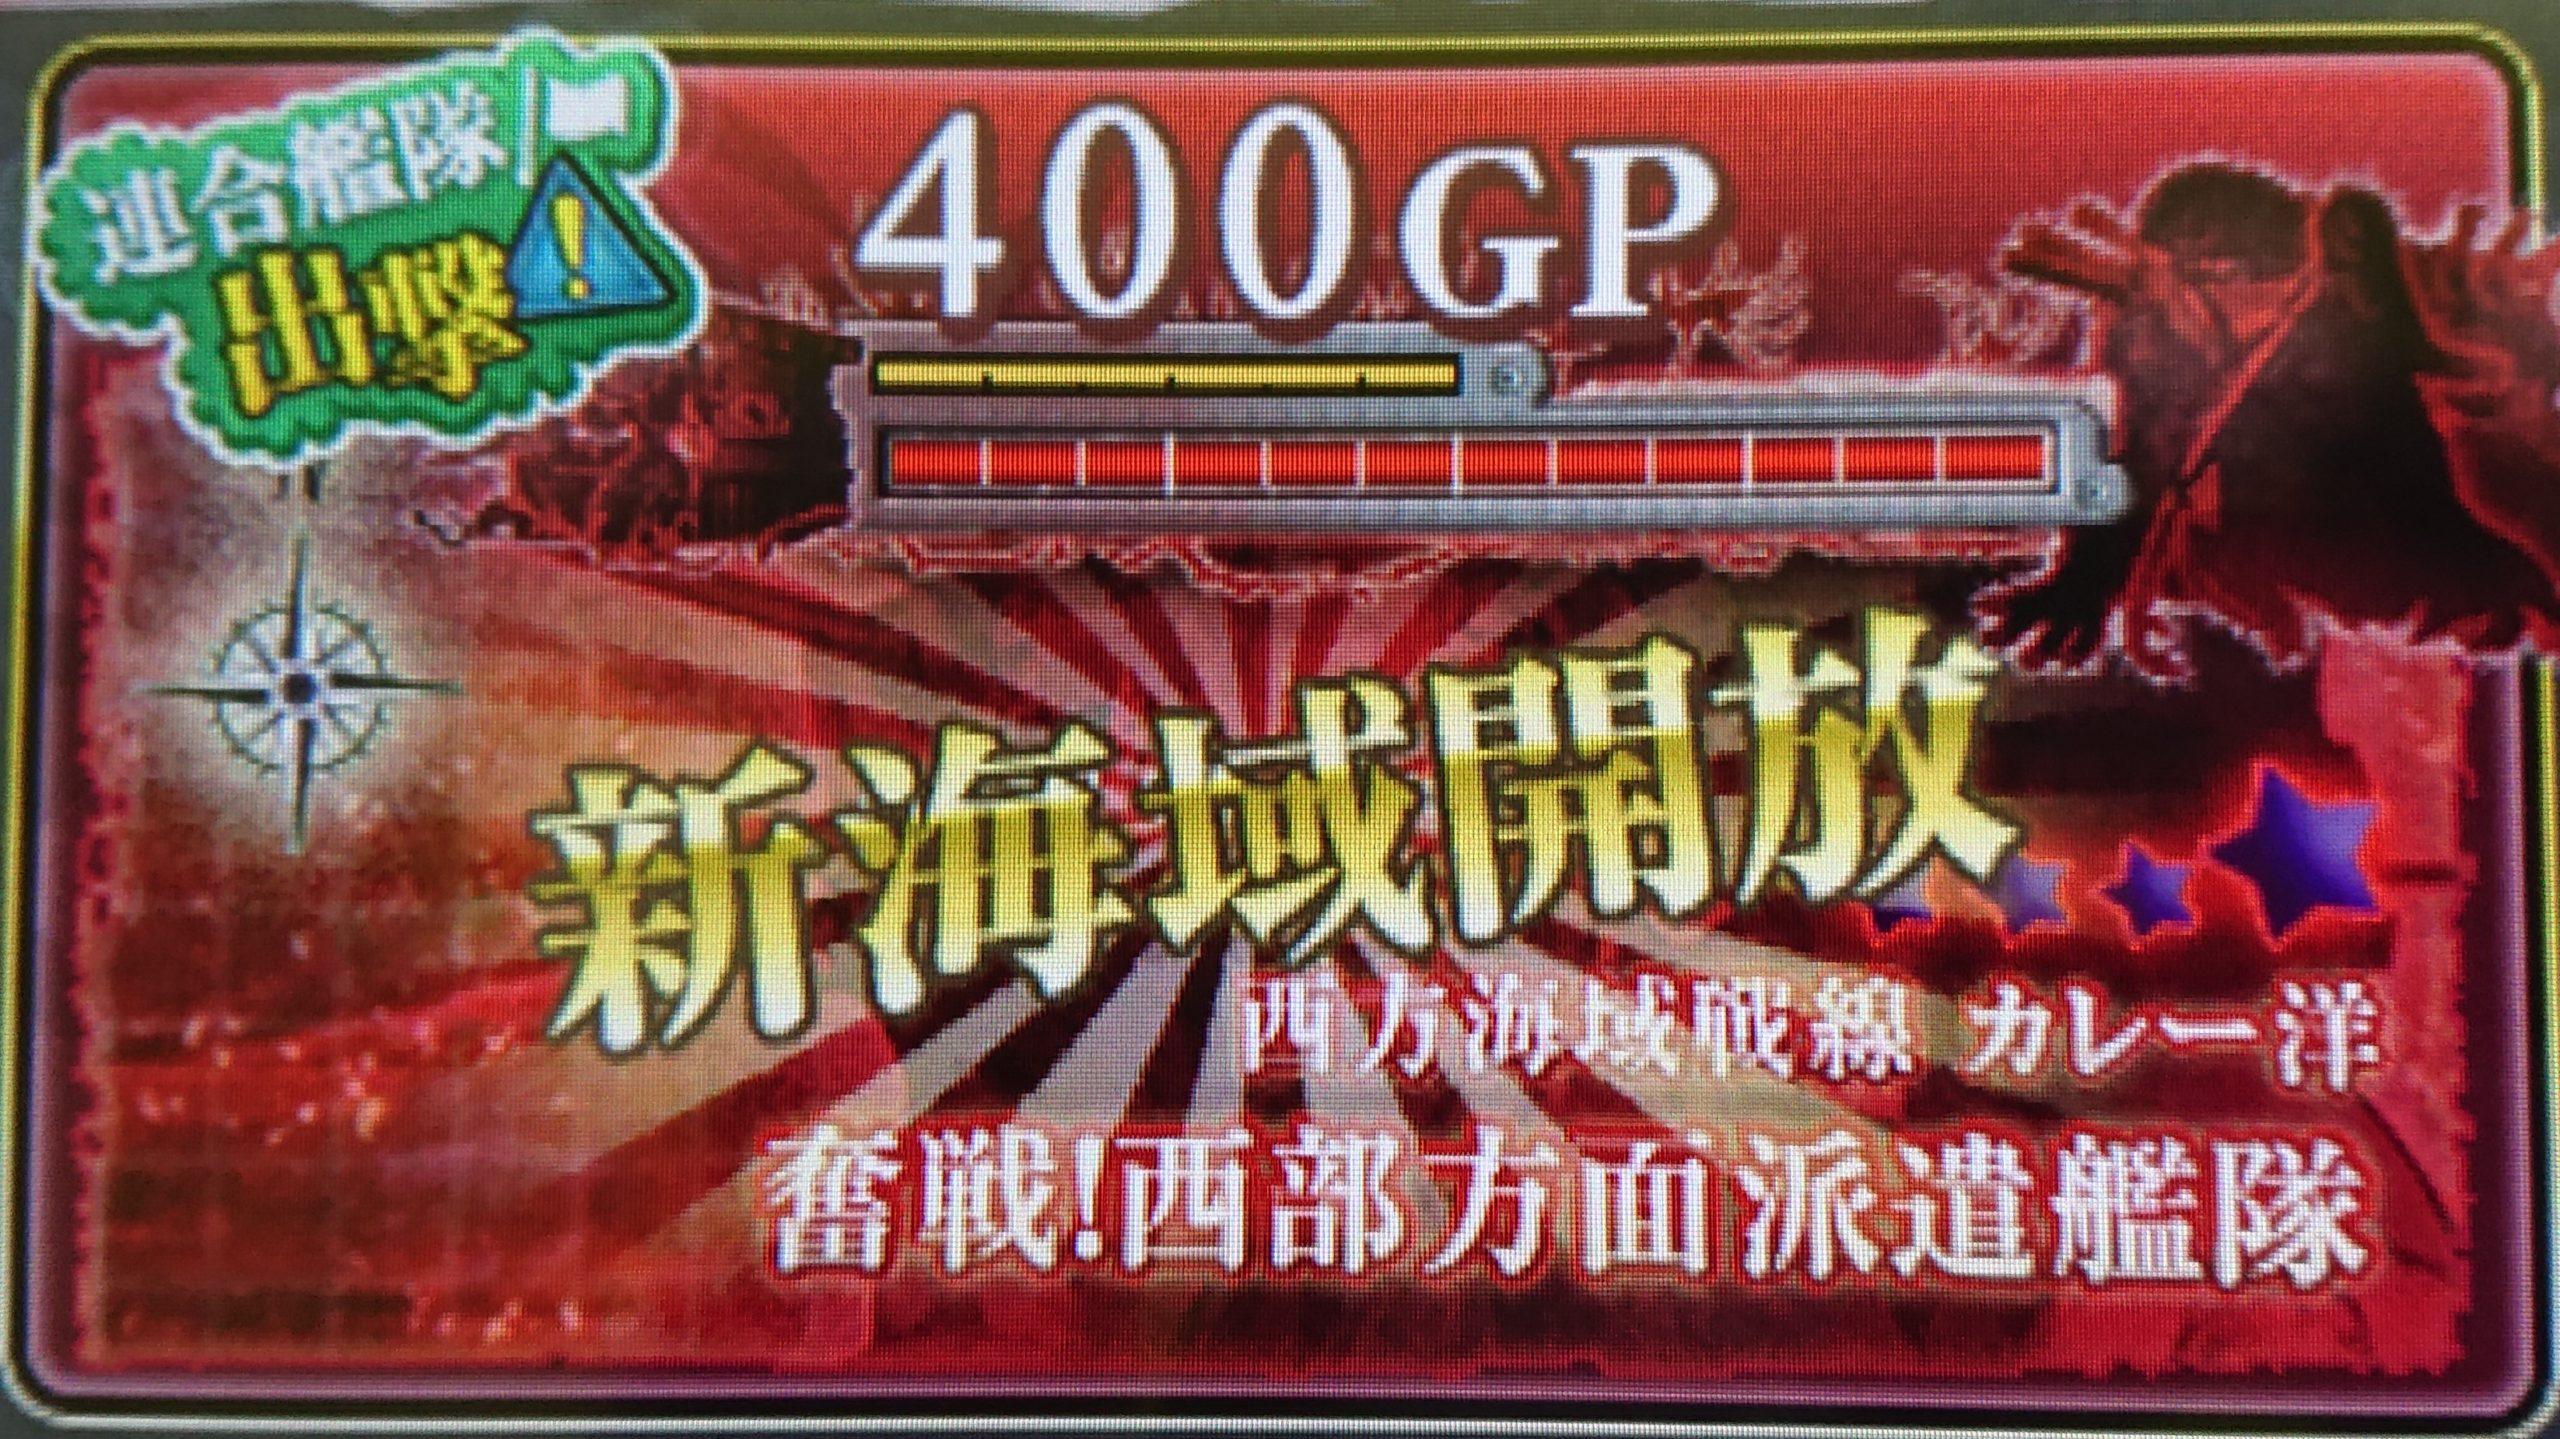 【AC】E4-2 奮戦!西部方面派遣艦隊(甲作戦)メインゲージ攻略